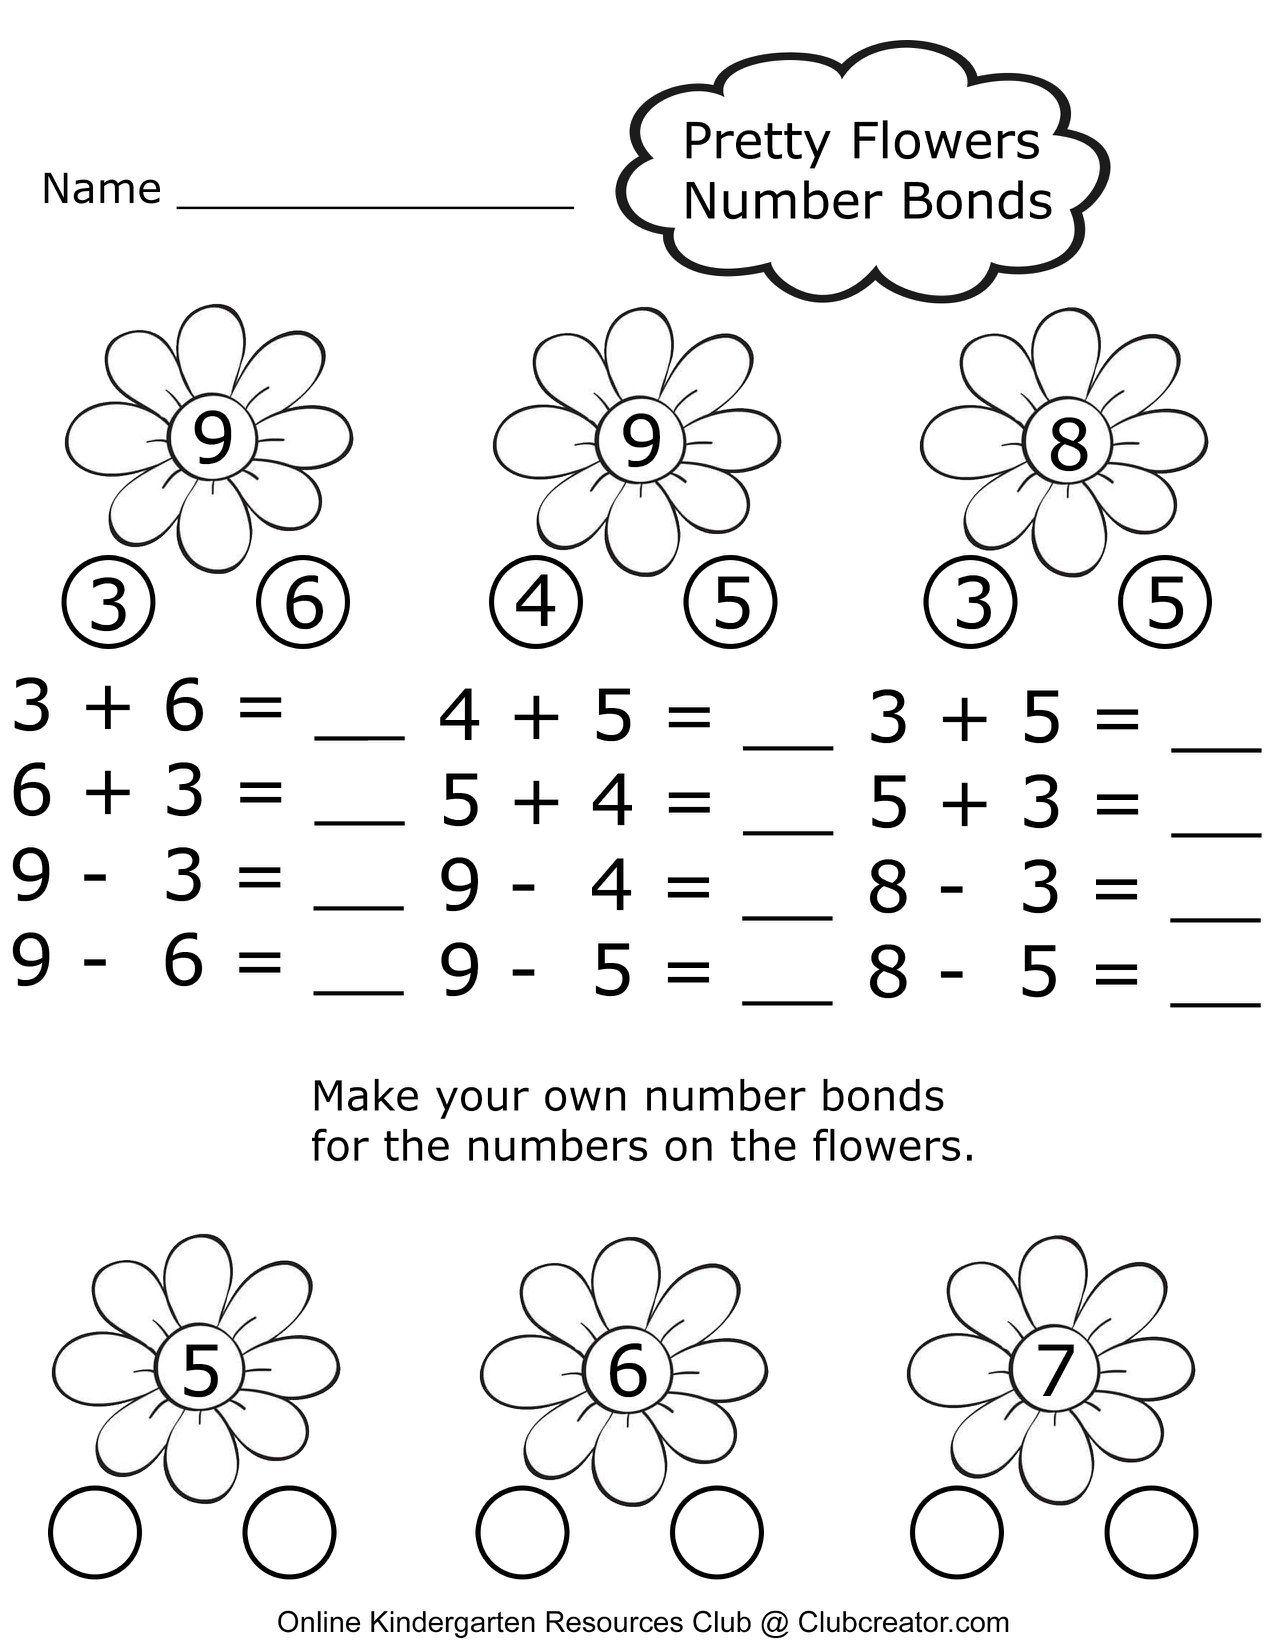 Number Bonds Worksheet Number Bonds Worksheets Numbers Kindergarten Kindergarten Worksheets [ 1650 x 1275 Pixel ]